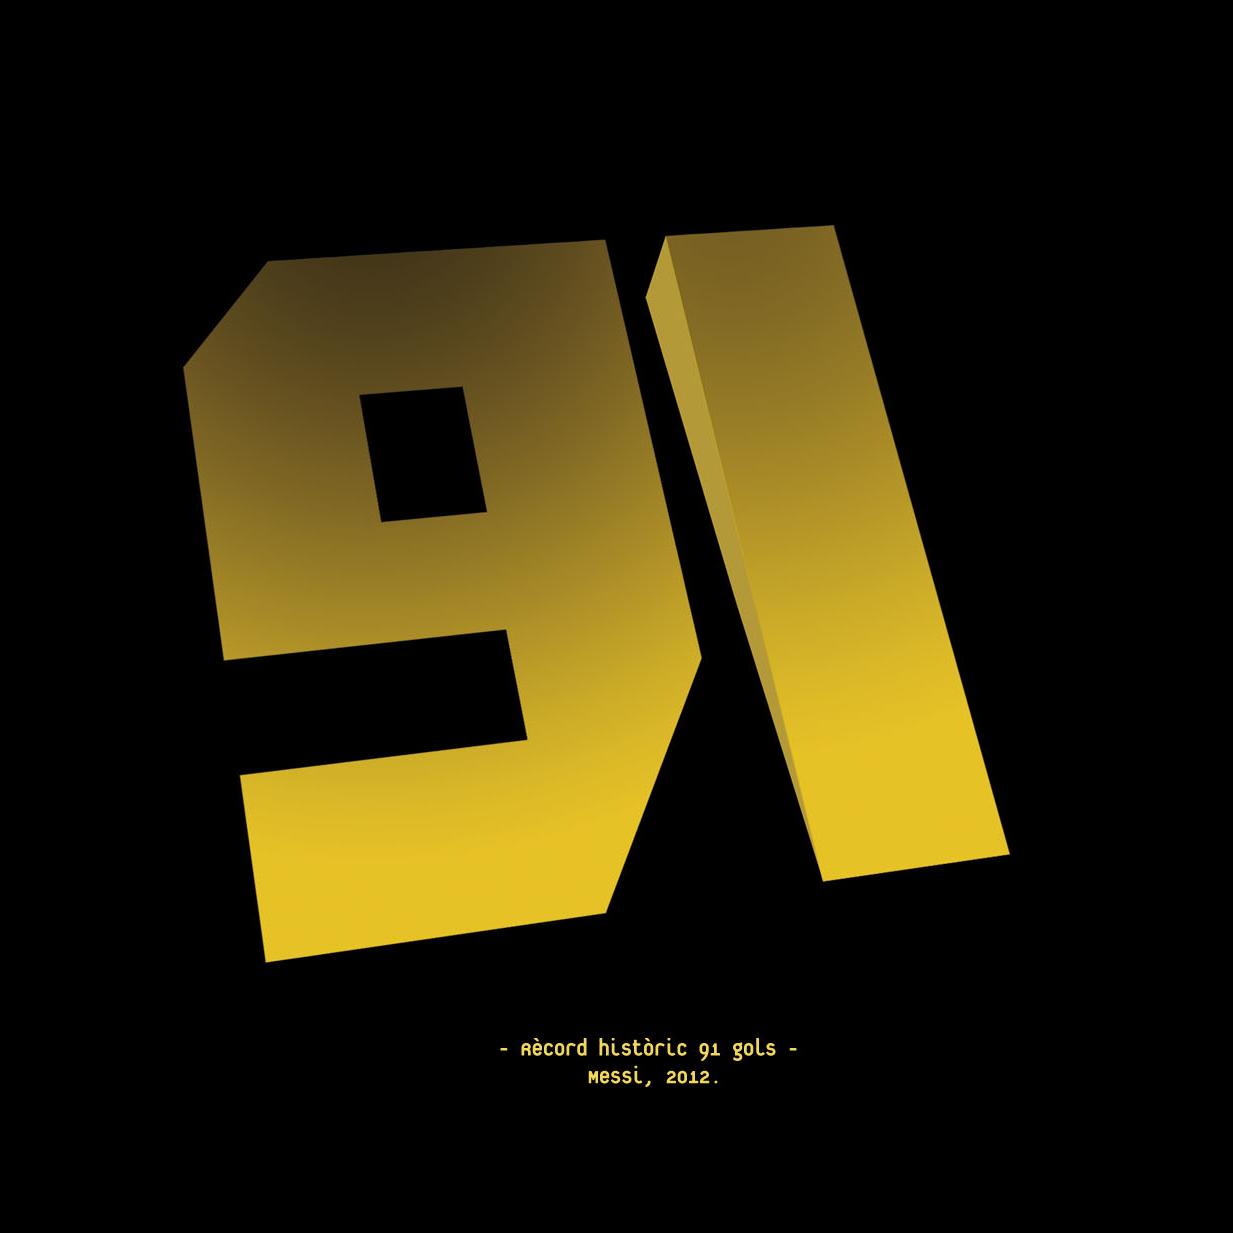 messi-fc-barcelona-tribute-91-goals-branding-nike